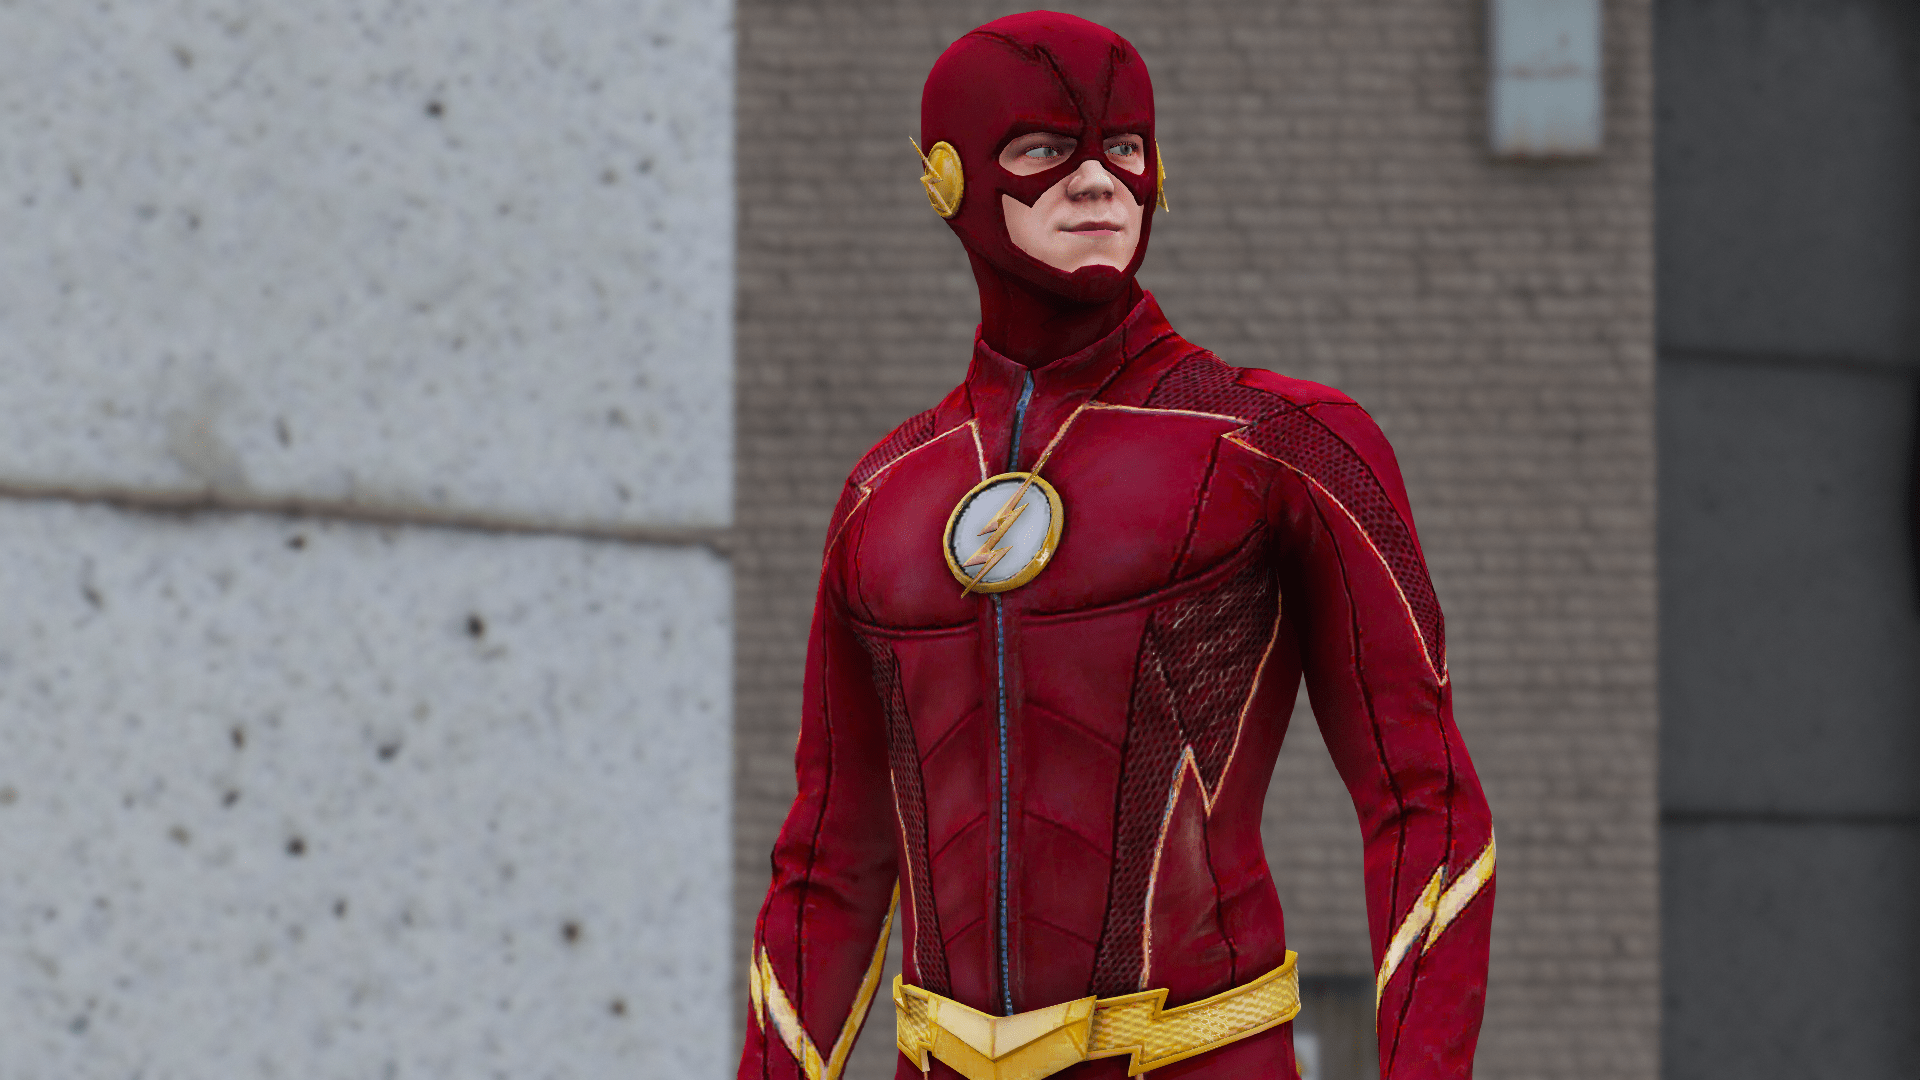 CW The Flash Season 4 Suit - GTA5-Mods.com